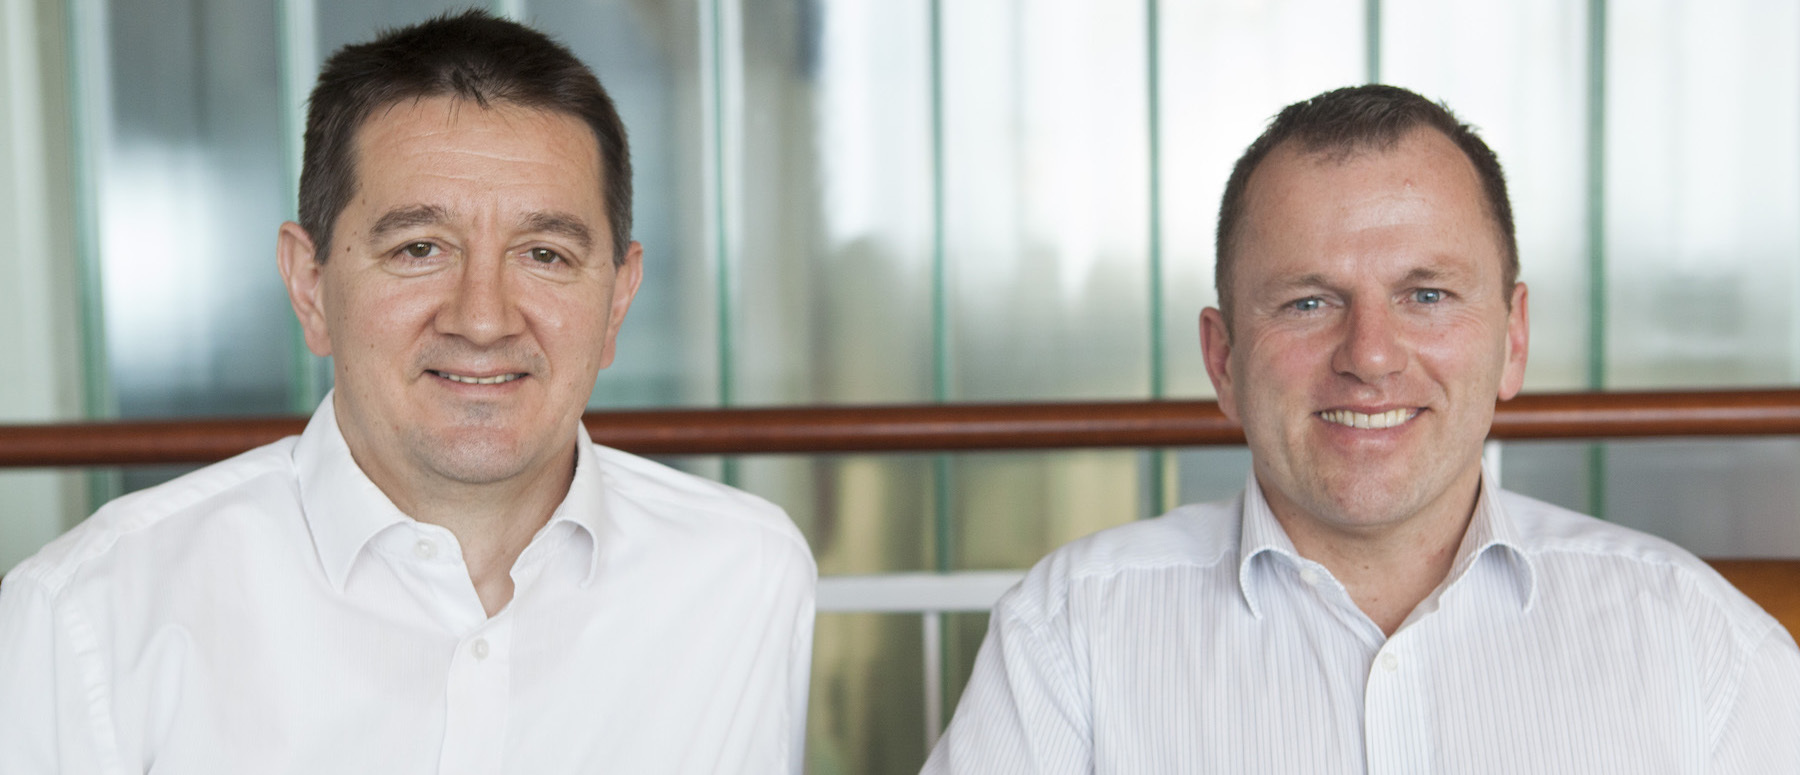 trusted blogs Gründer: Rüdiger Schmidt und Eddy Andrae